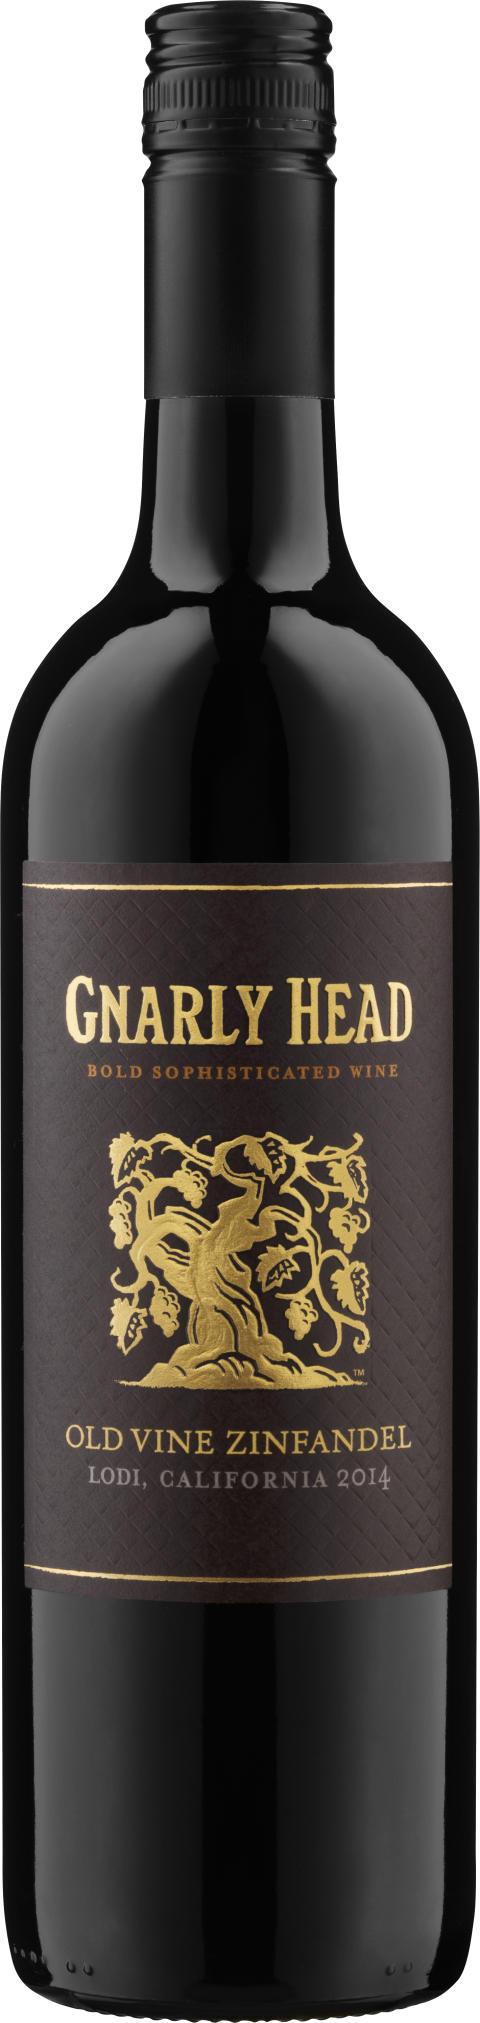 Gnarly Head-Old Vine Zinfandel